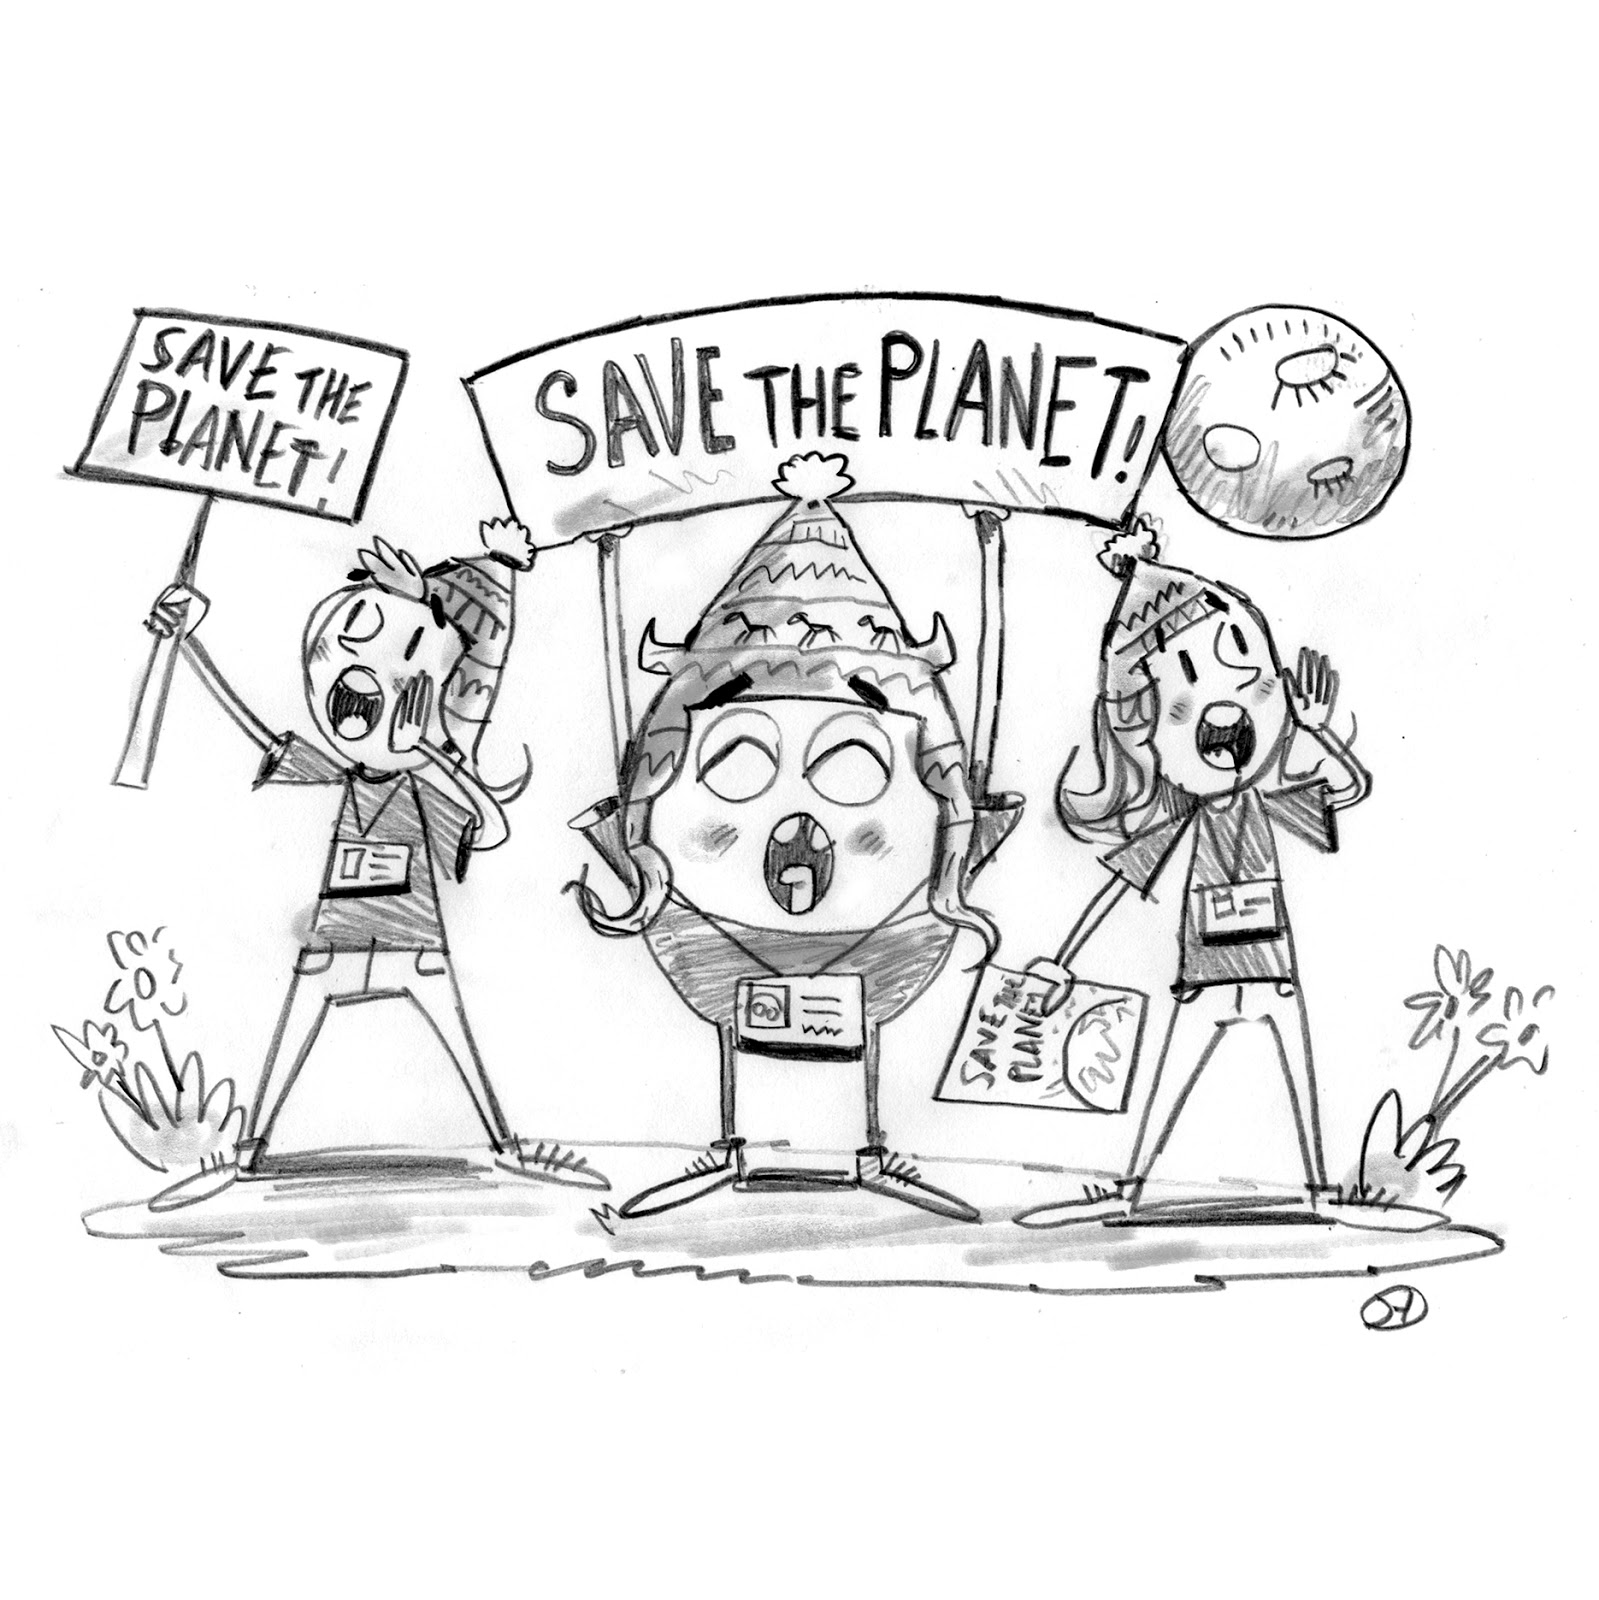 1599x1600 David Hurtado Illustration Blog Save The Planet Pencil Sketch